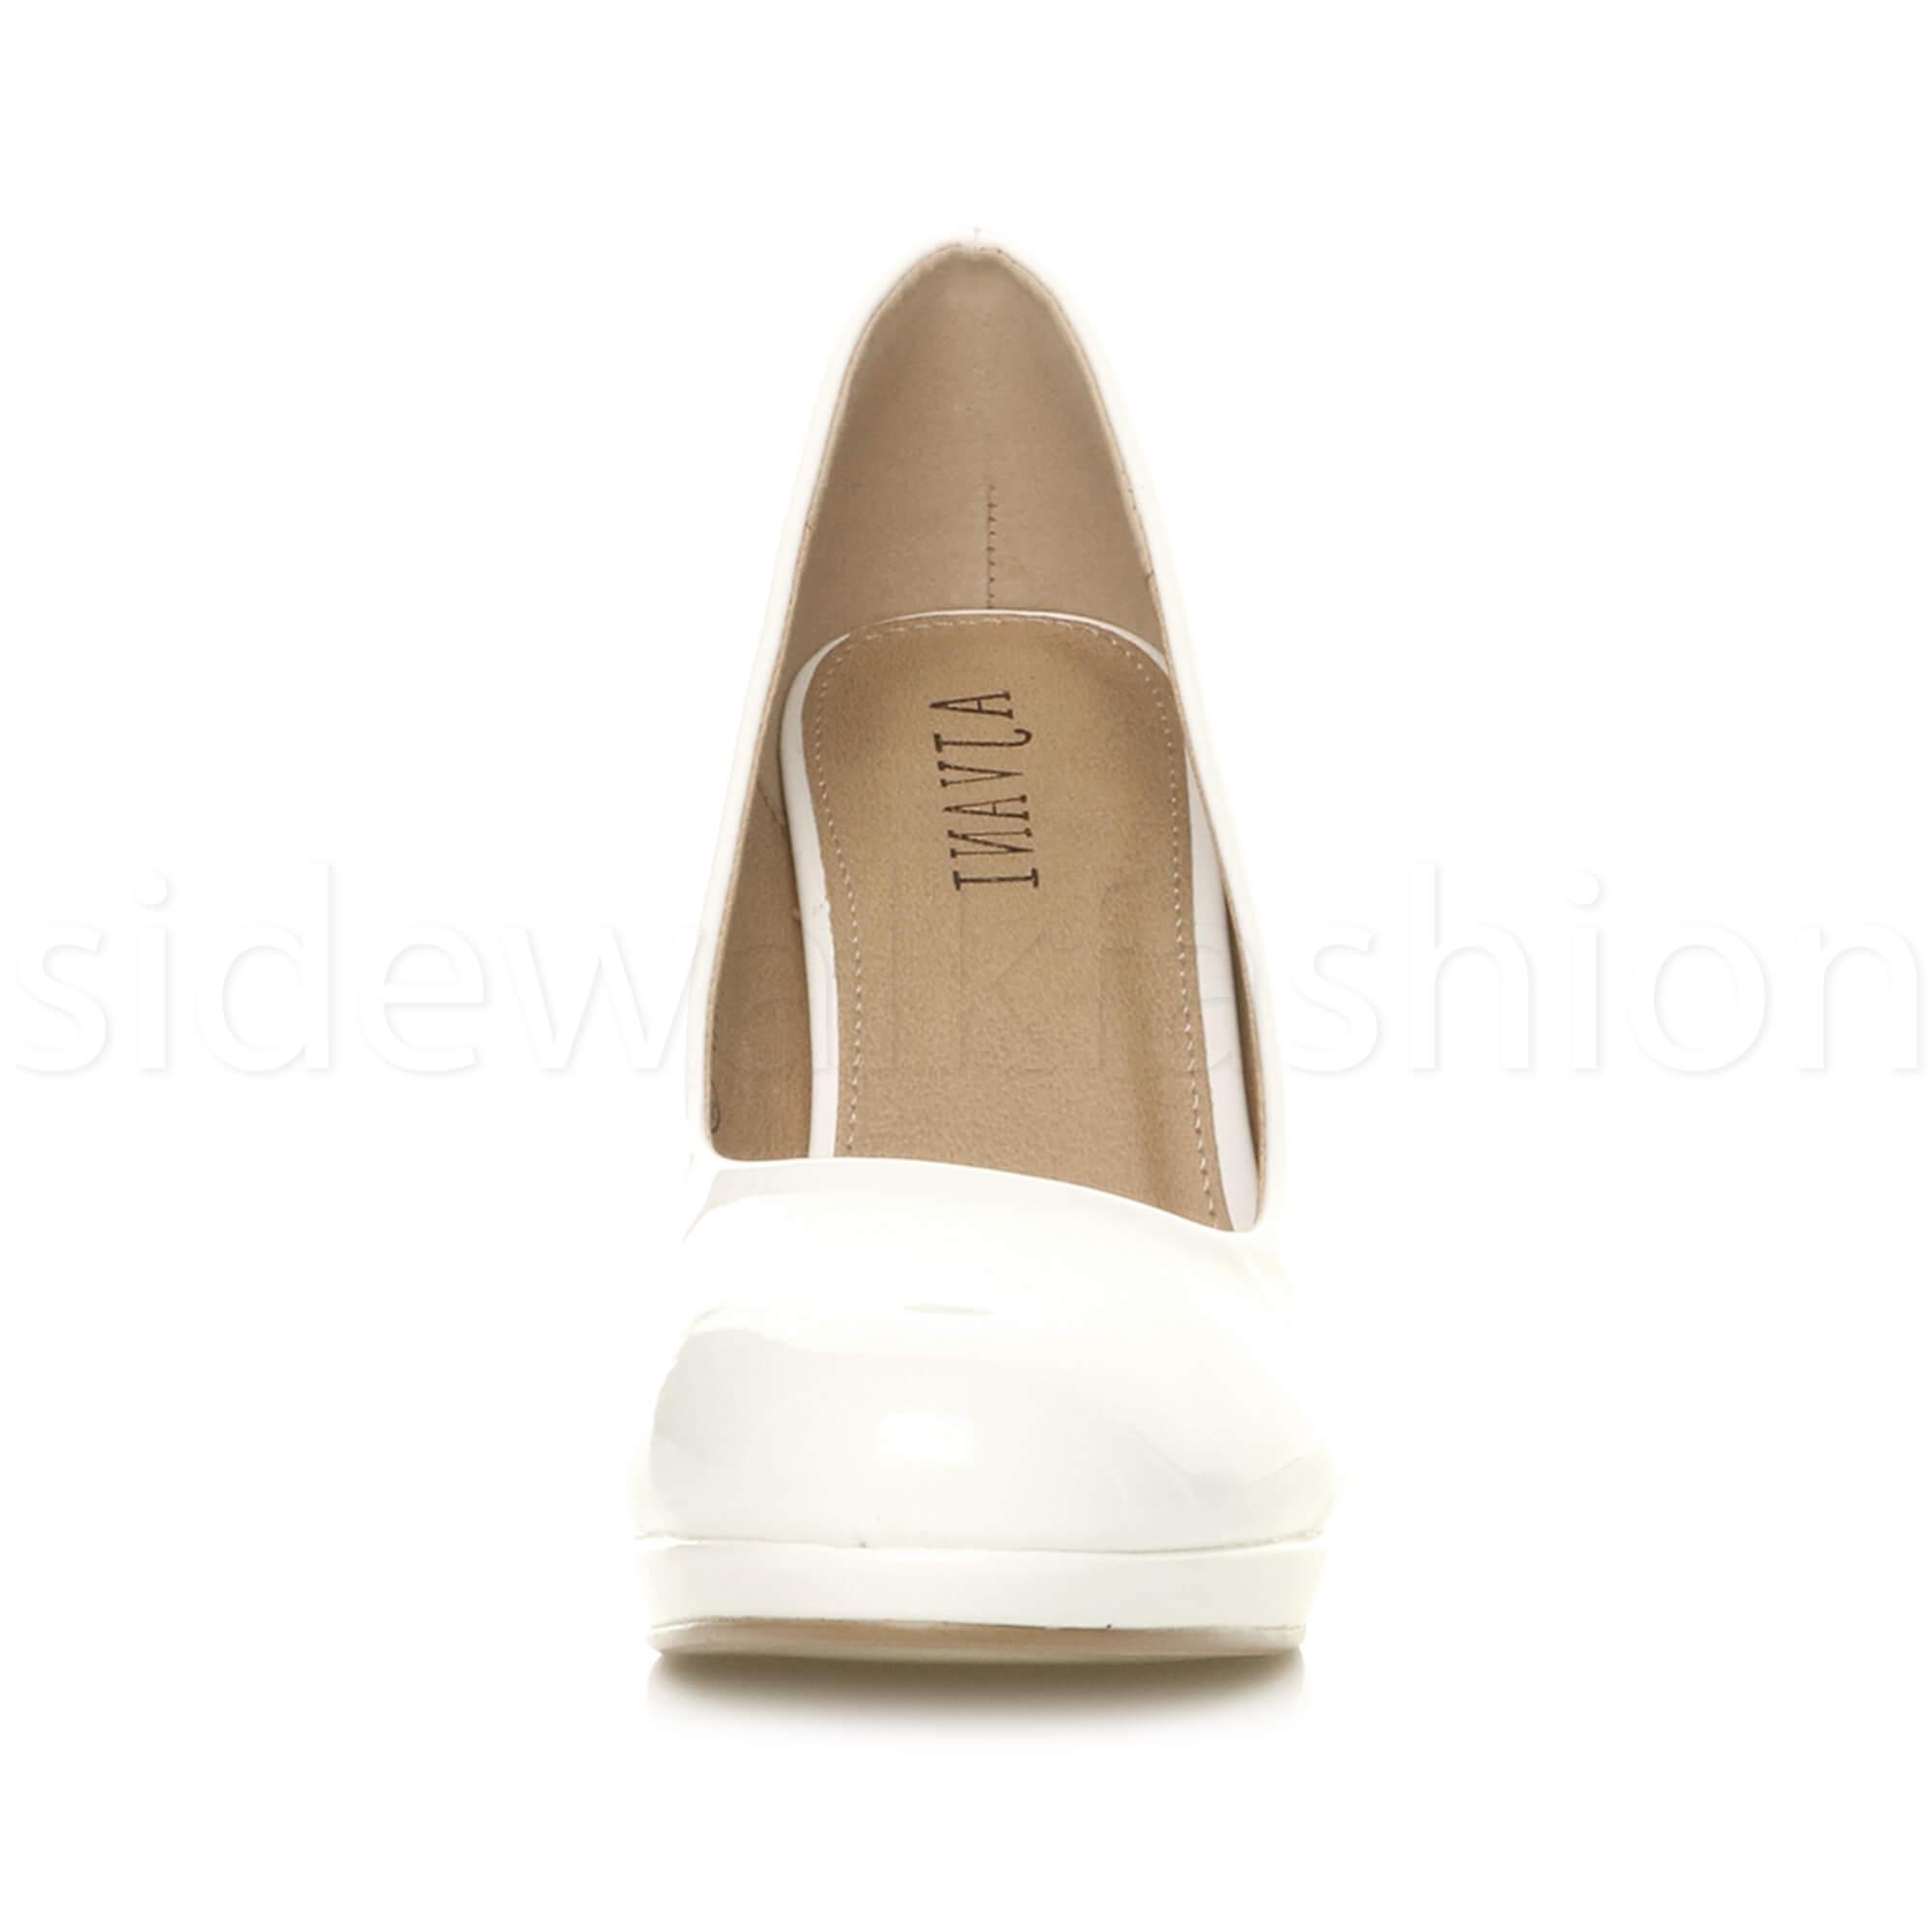 Womens-ladies-high-mid-heel-platform-wedding-evening-bridesmaid-court-shoes-size thumbnail 195